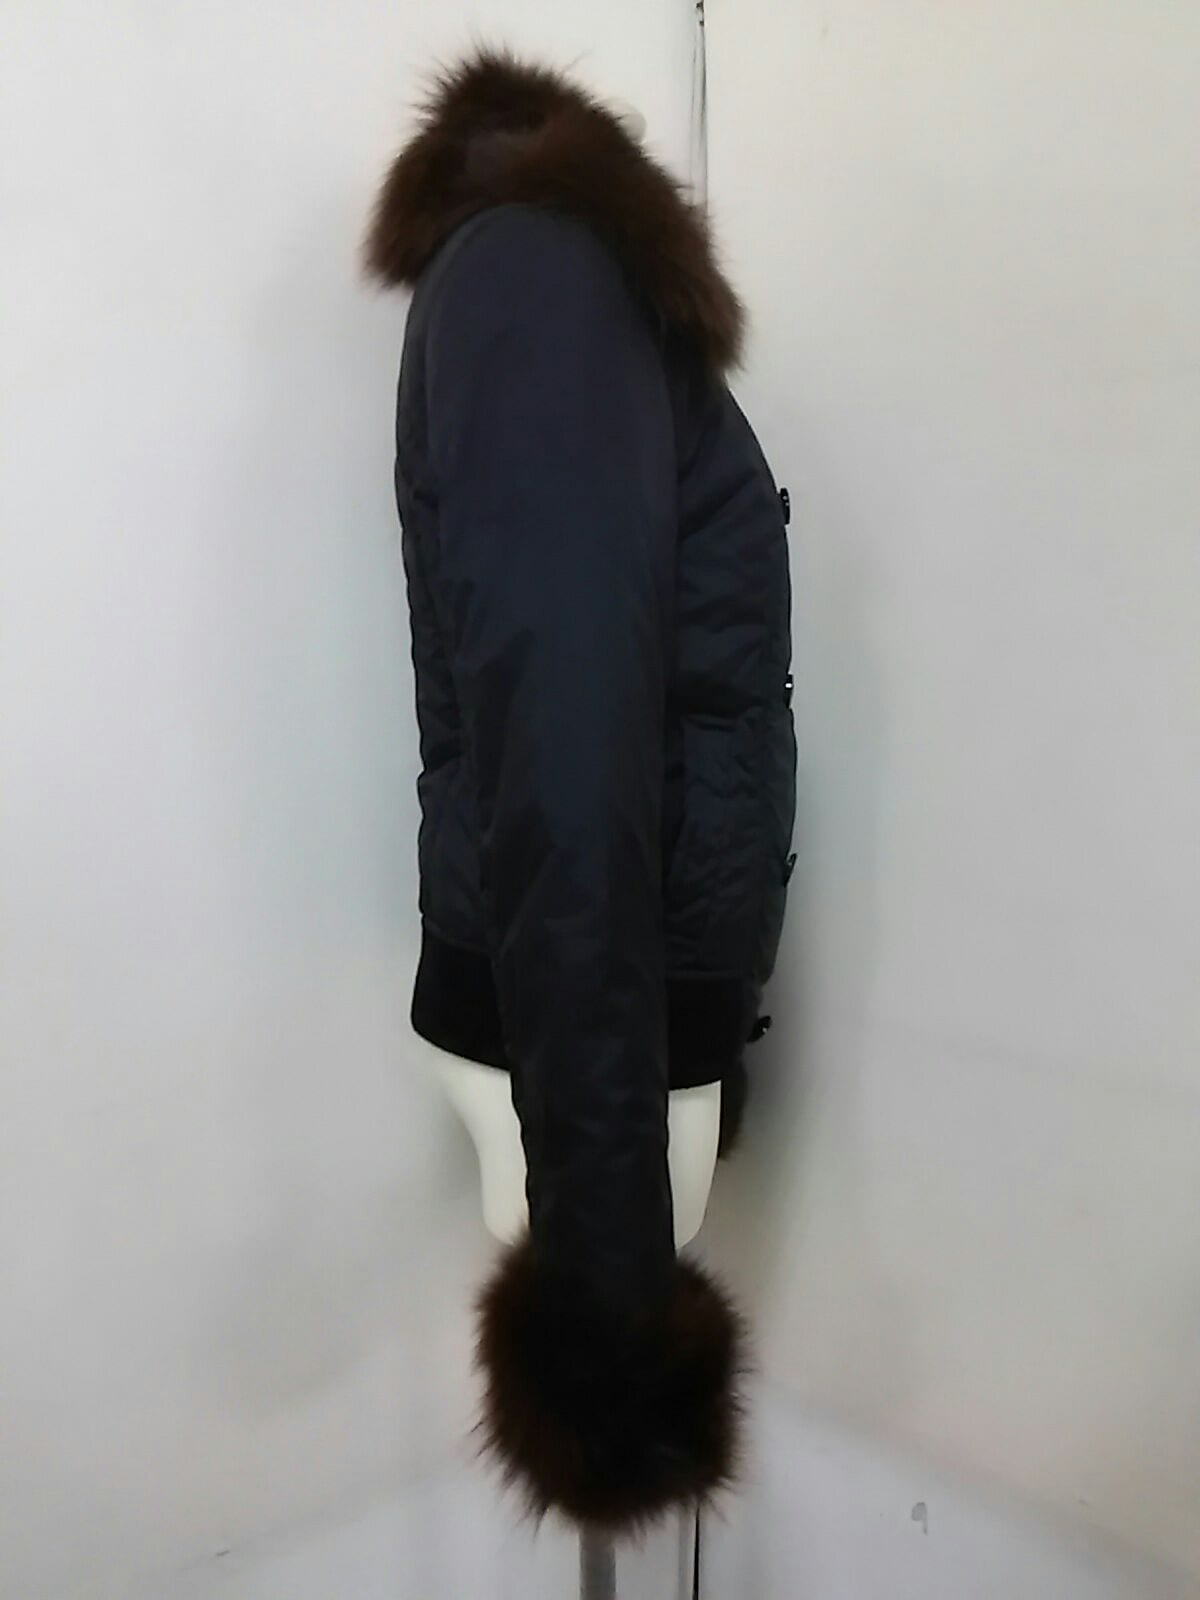 JILL STUART(ジルスチュアート)のダウンジャケット